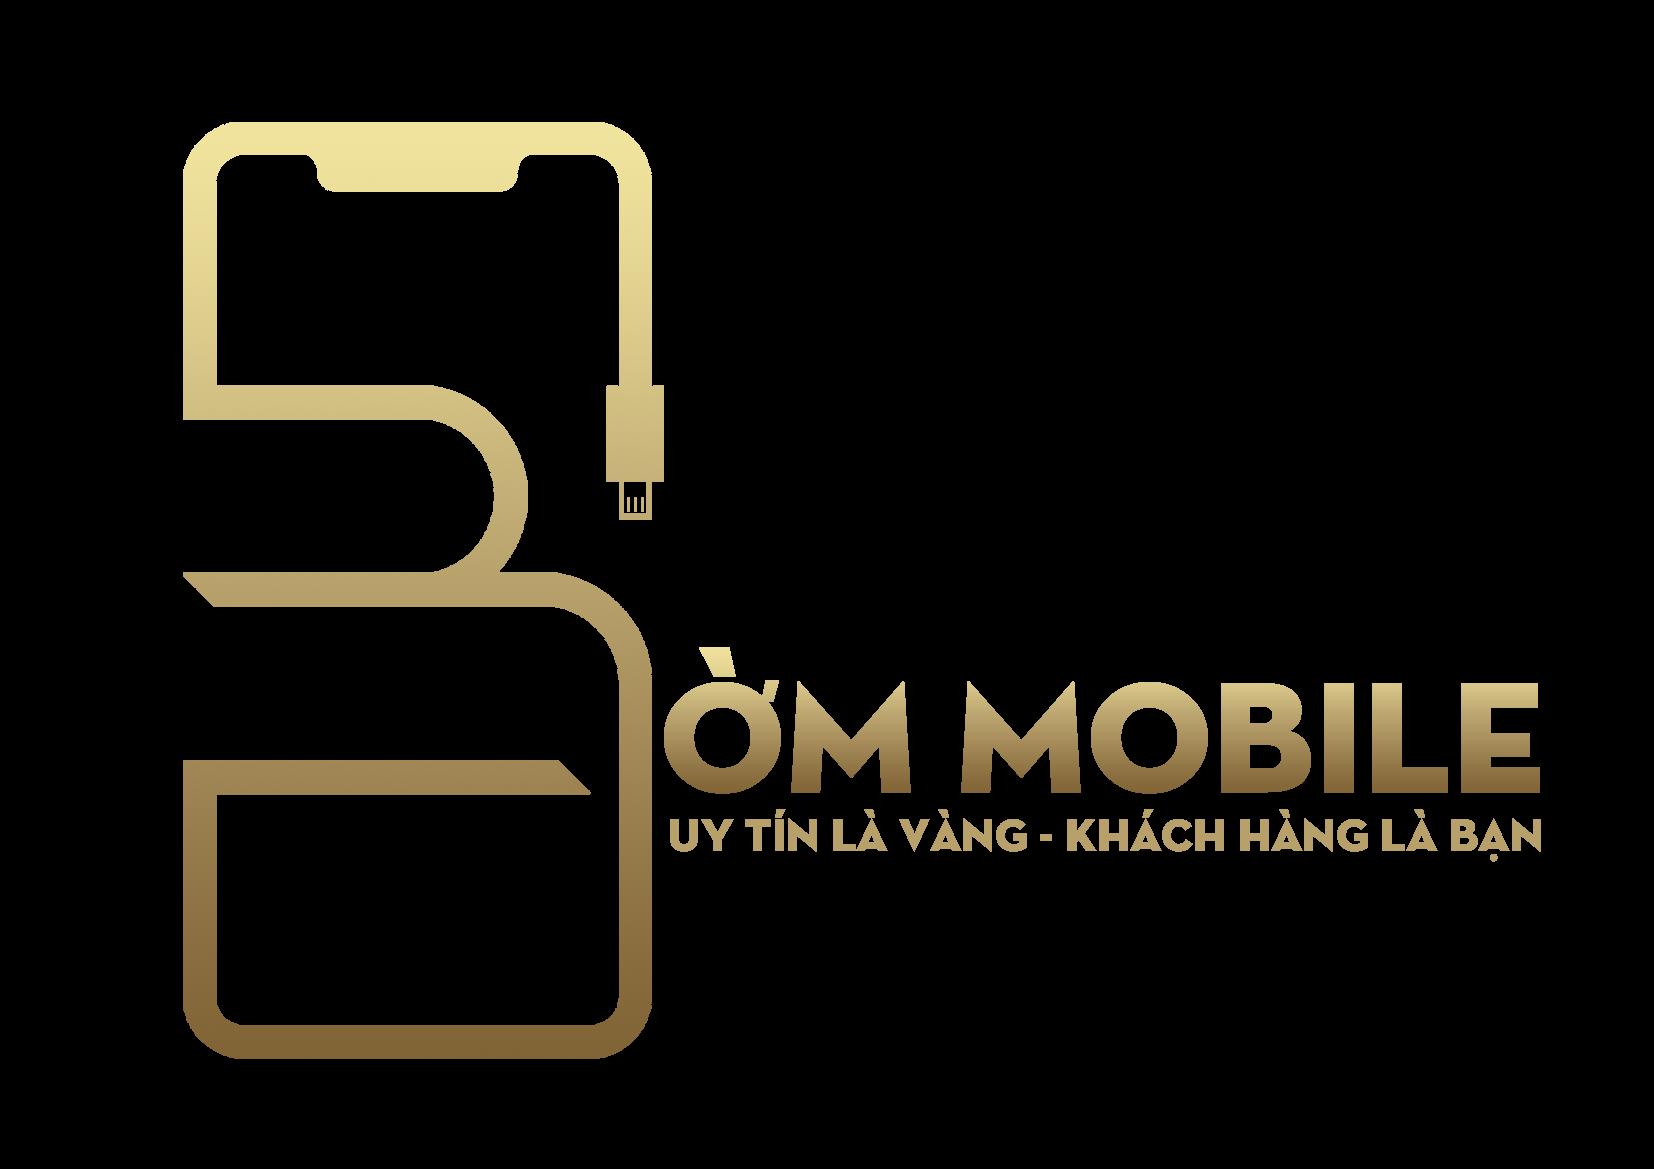 Bờm Mobile